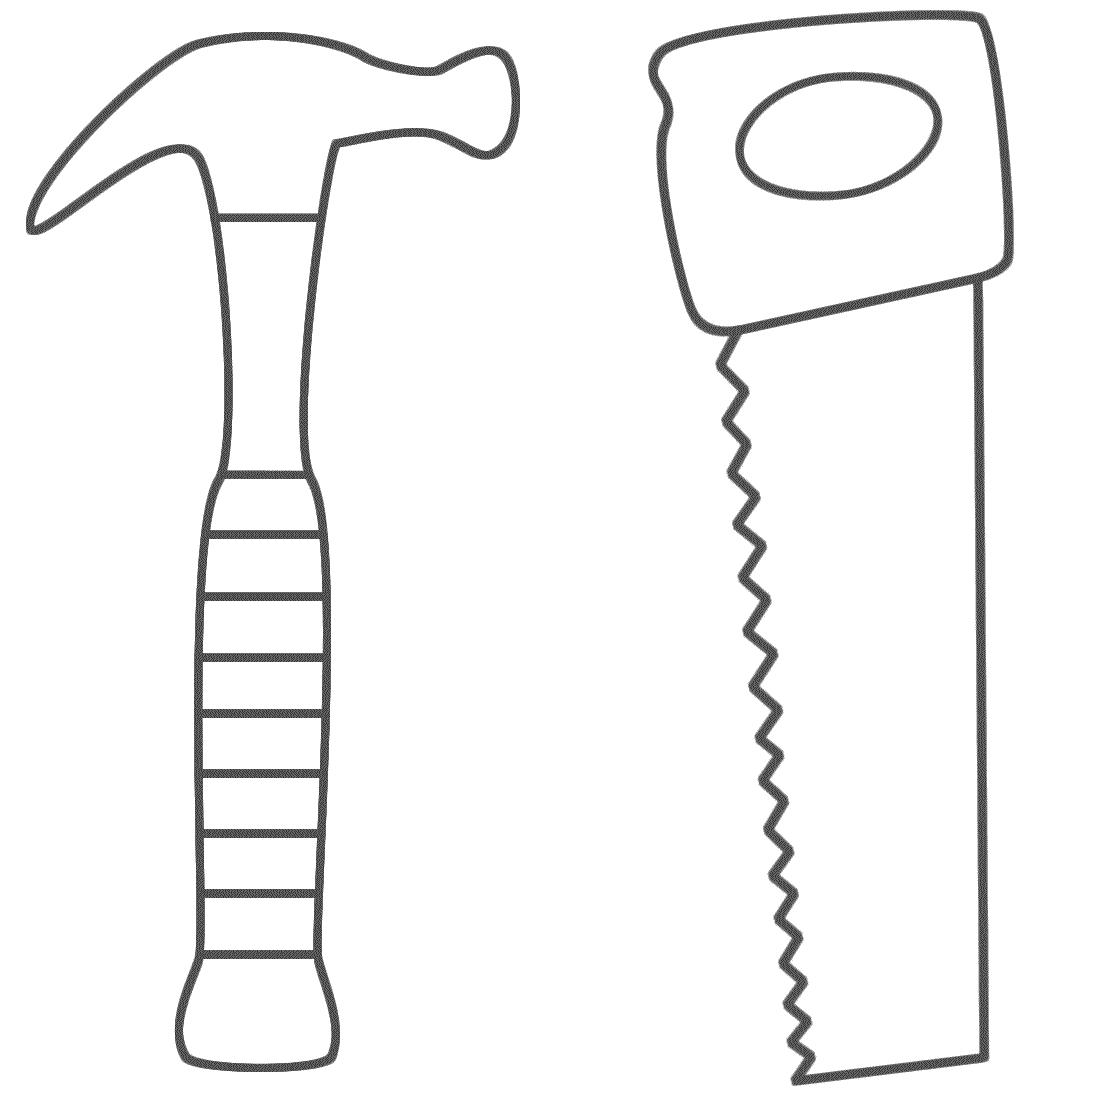 Hammer coloring #6, Download drawings